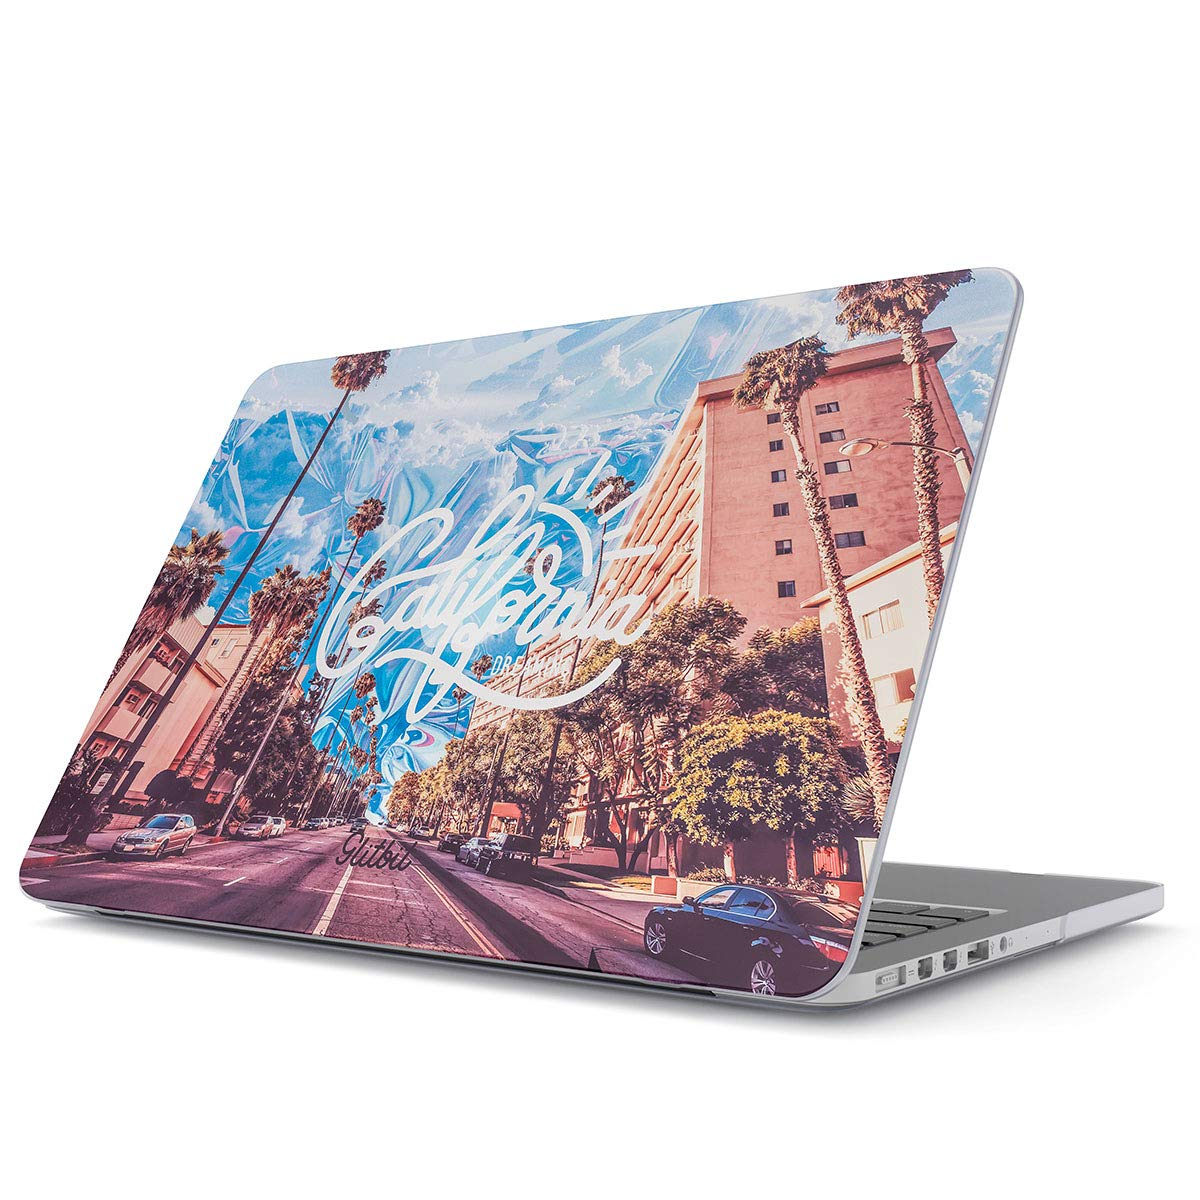 Glitbit Funda para MacBook 12 Pulgadas, Modelo: A1534 con Retina Display California Dreaming Sunny Cali USA Palm Trees Summer Good Vibes Viaje ...